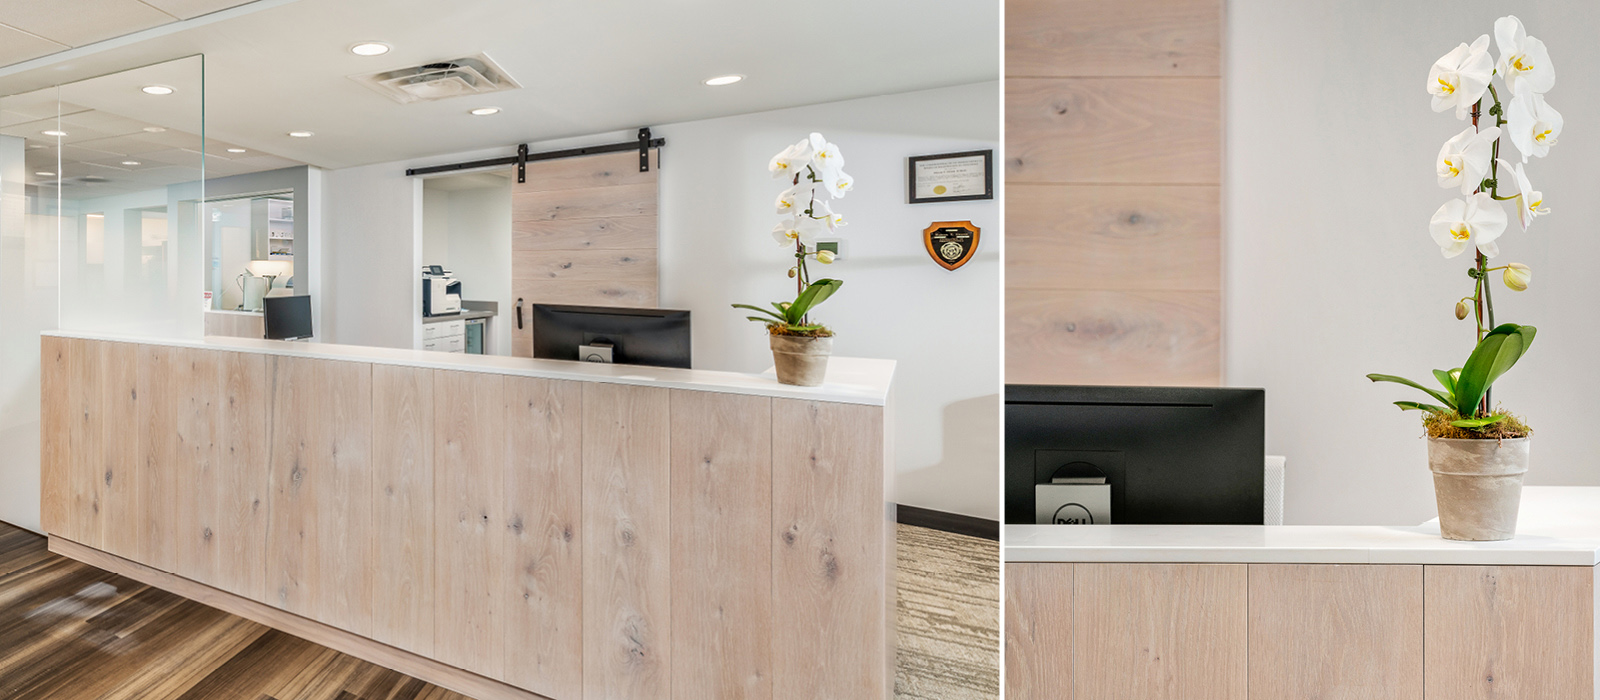 Direct Pay Dental Care reception desk